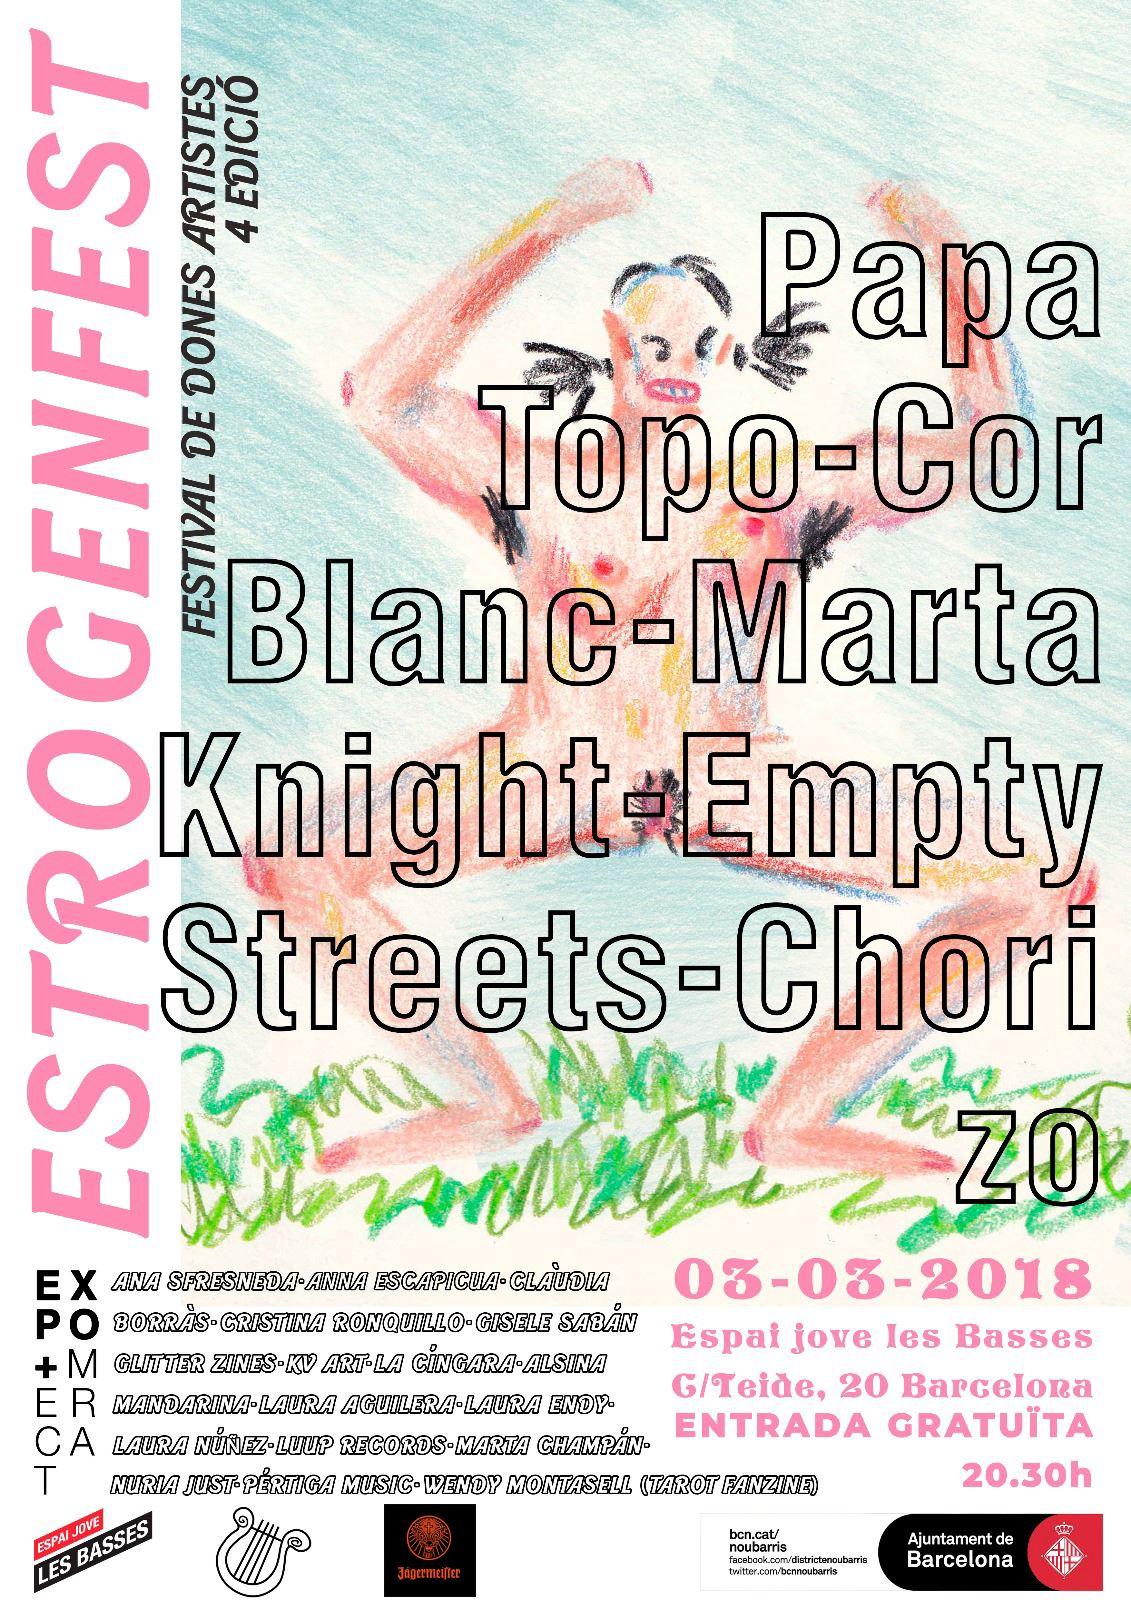 Estrogenfest